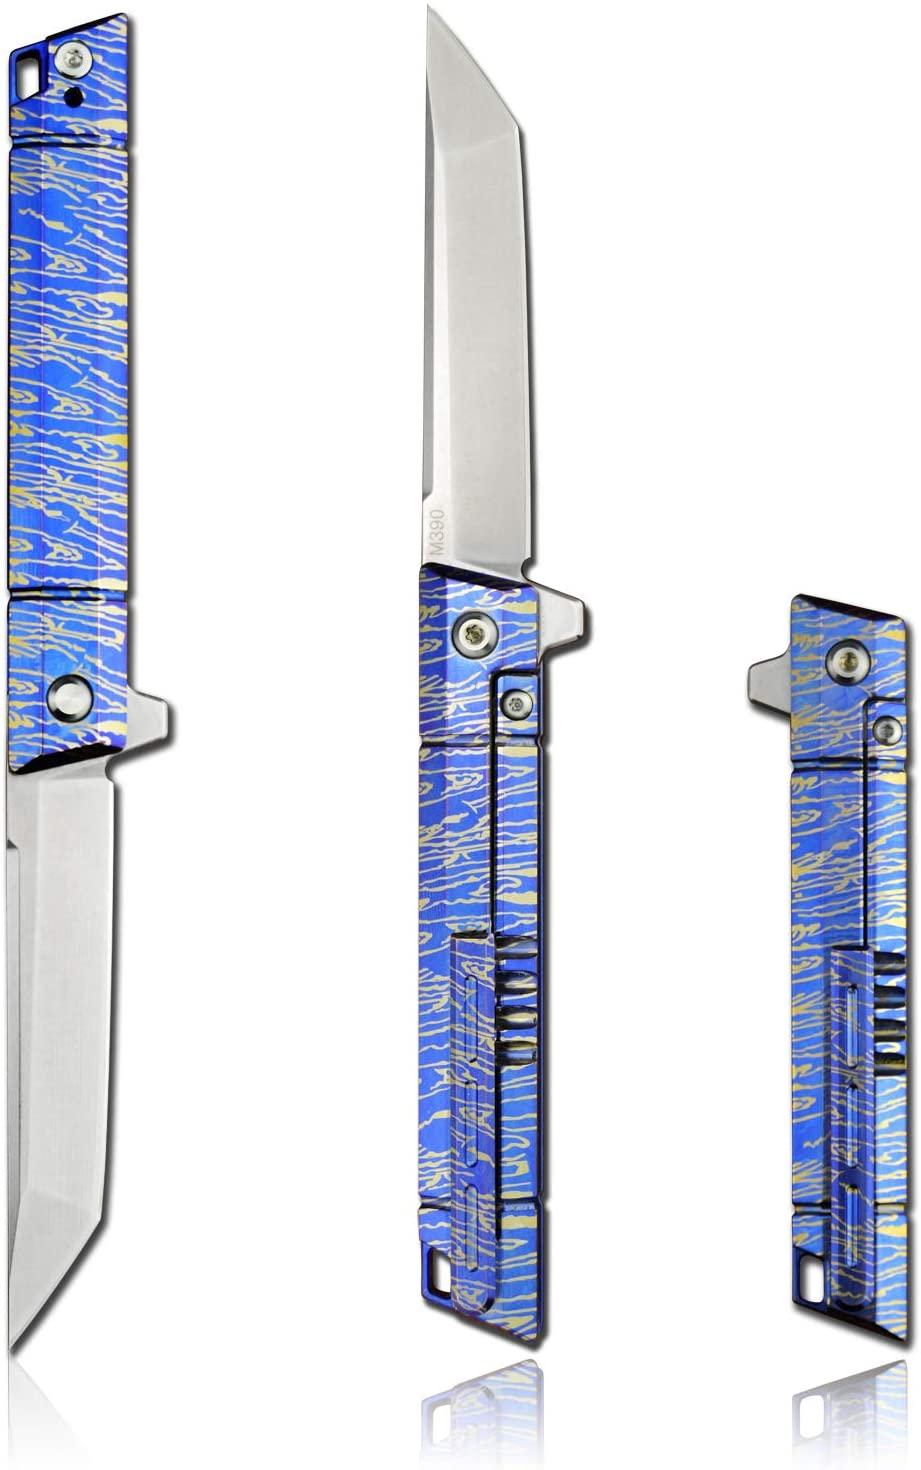 FENGZHU-M390 Folding Knife Powder Steel Folding Knife Mini Knife Tanto Point Tip with 3.9in Titanium Alloy Handle Portable Bearing Knife Outdoor EDC Tool